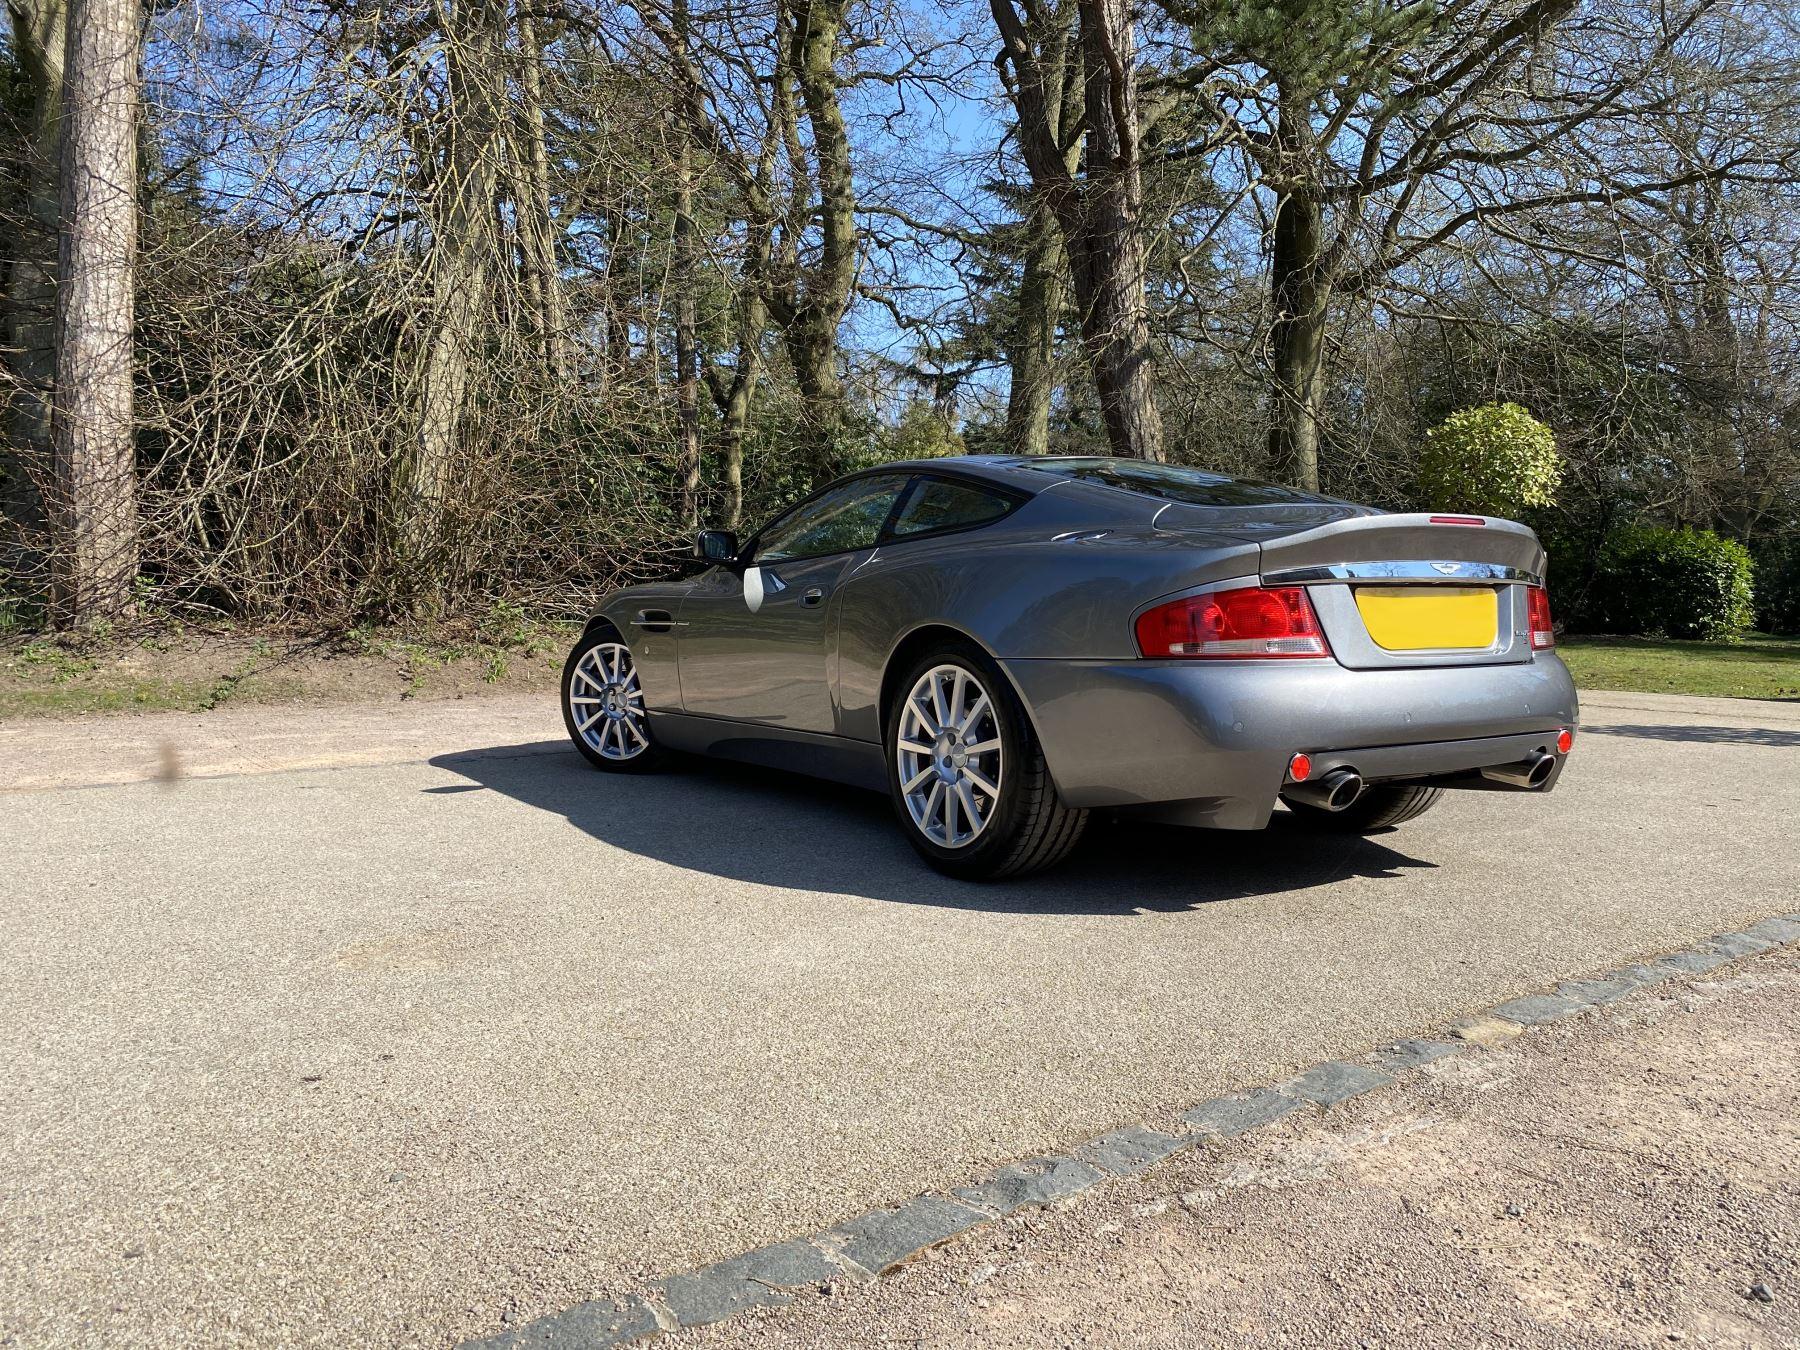 Aston Martin Vanquish S S V12 2+2 2dr image 17